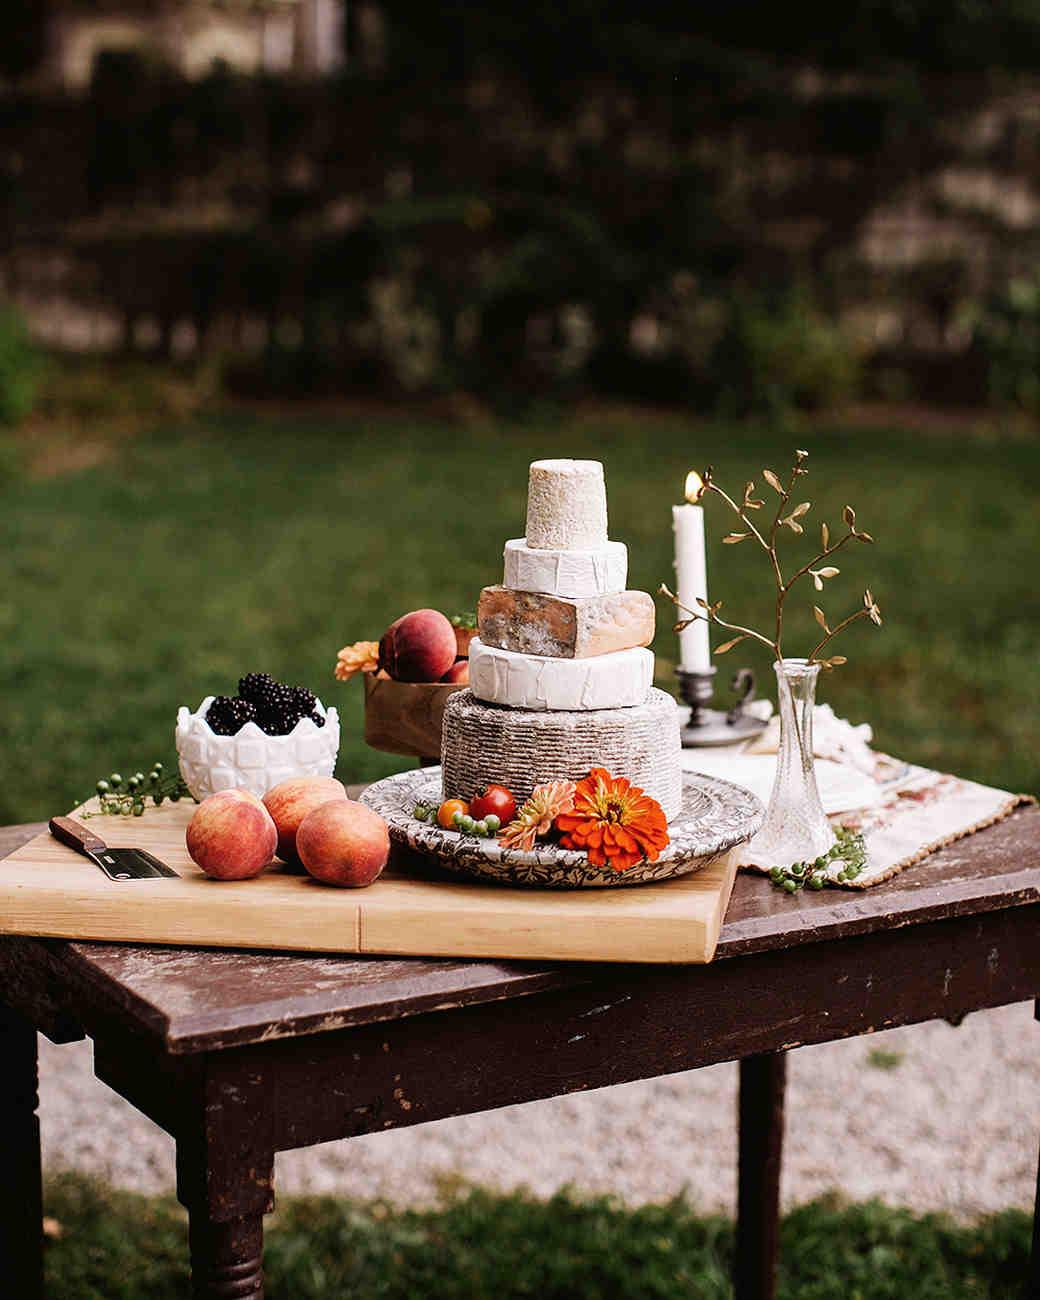 wedding-brunch-ideas-cheese-cake-0416.jpg